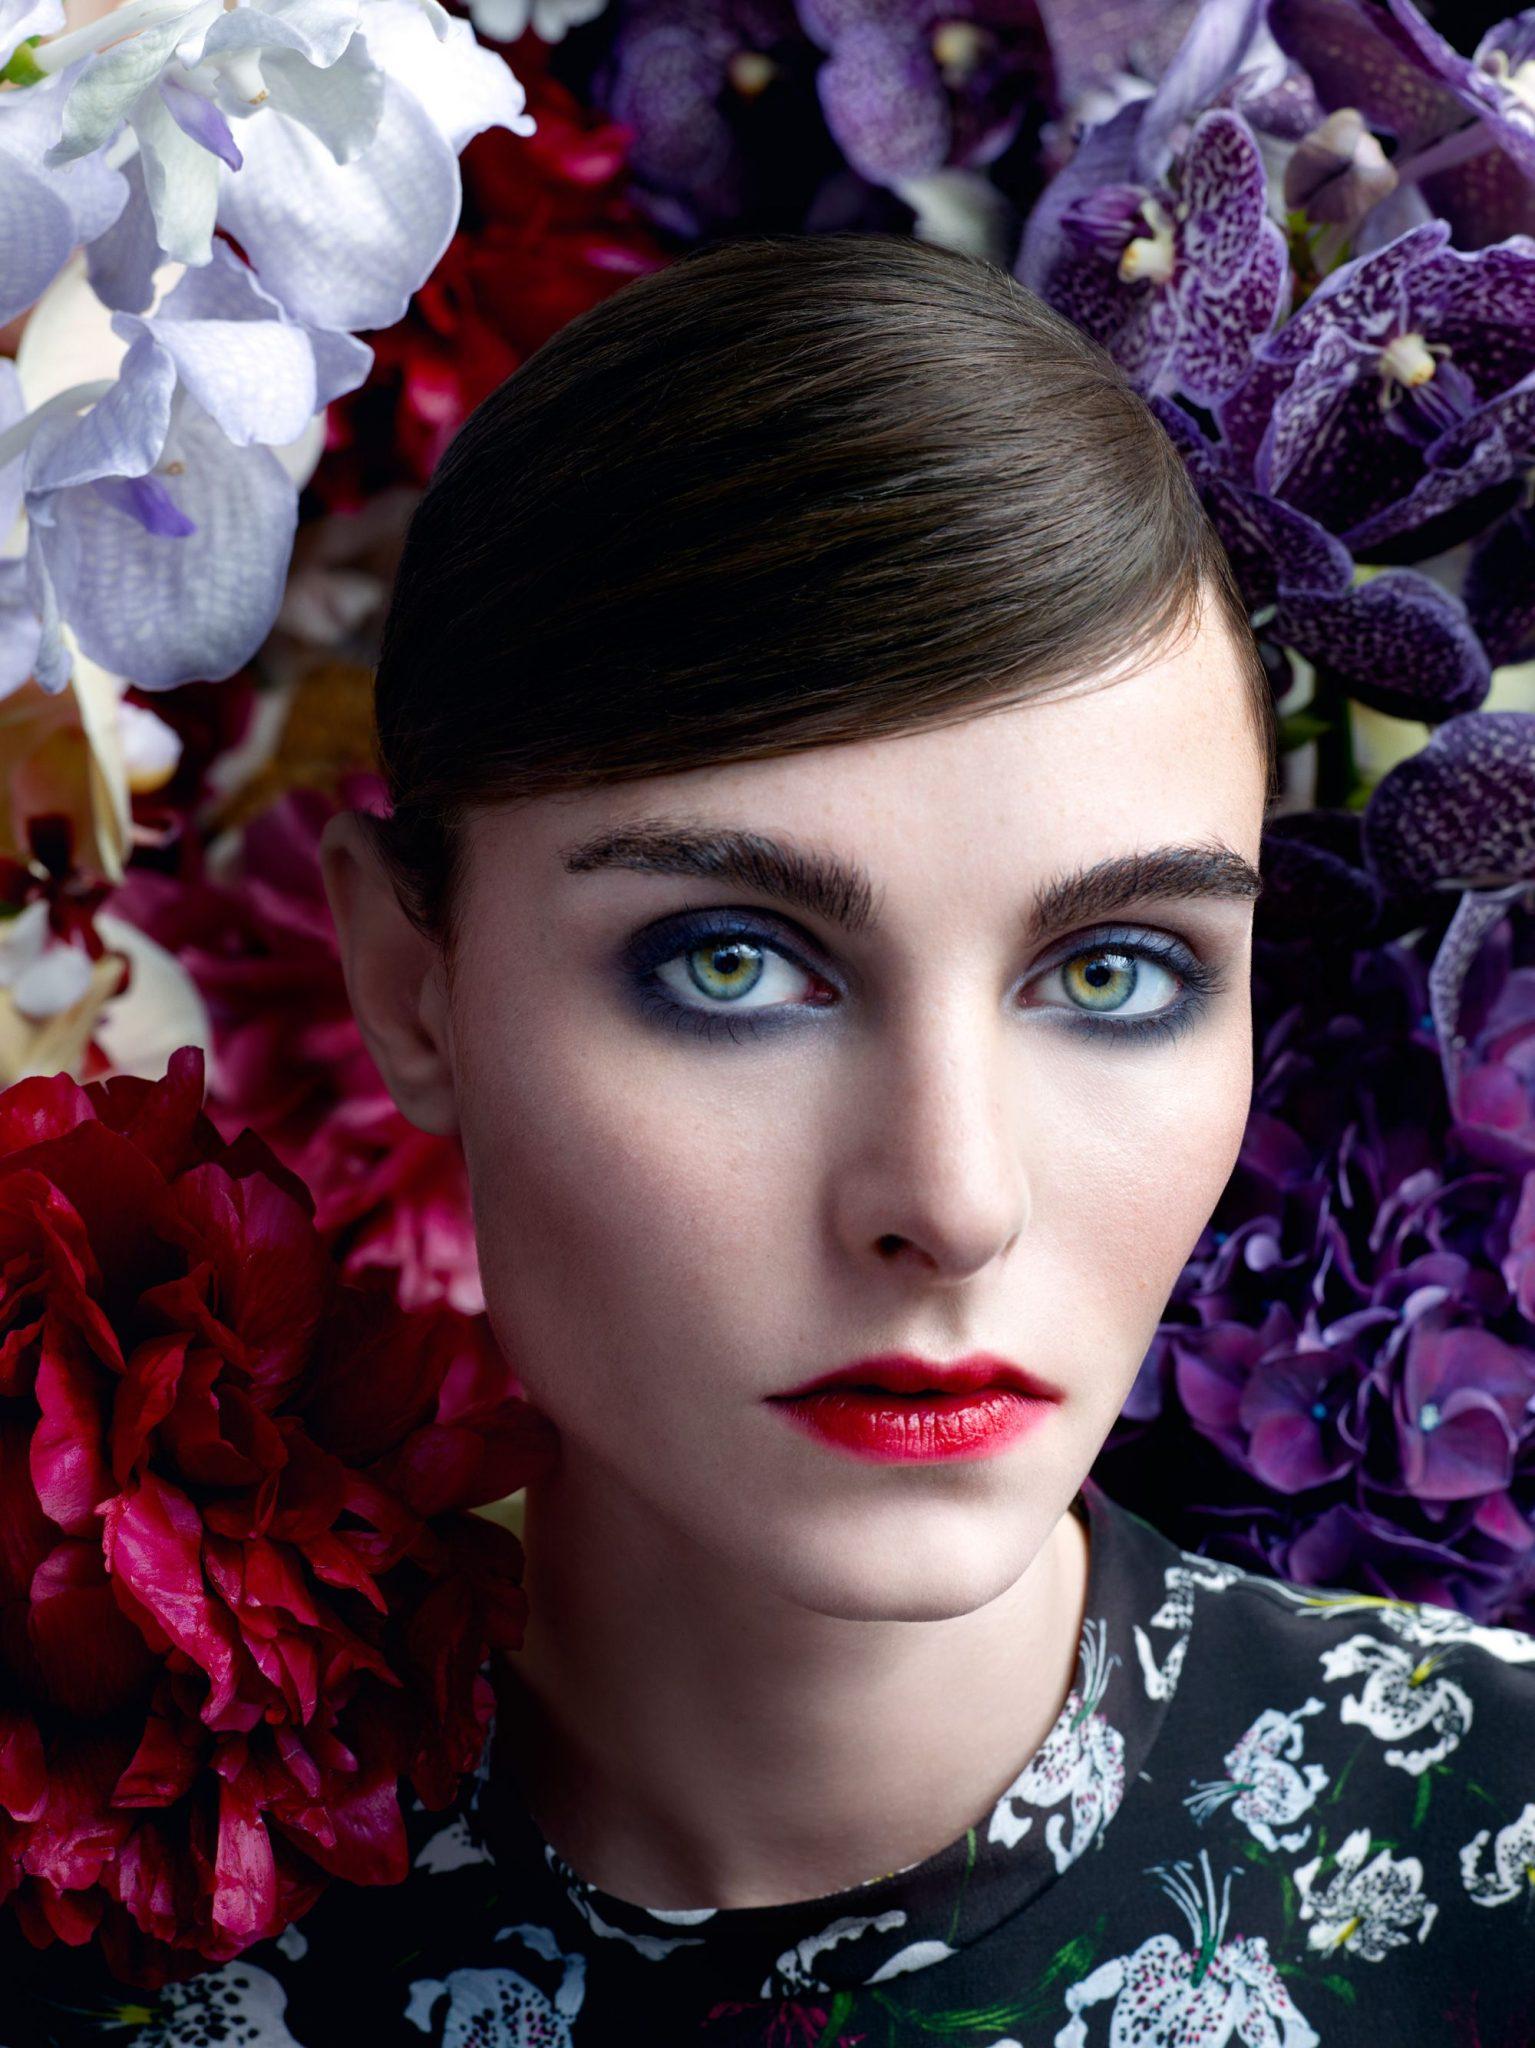 Erdem For NARS Strange Flowers Collection